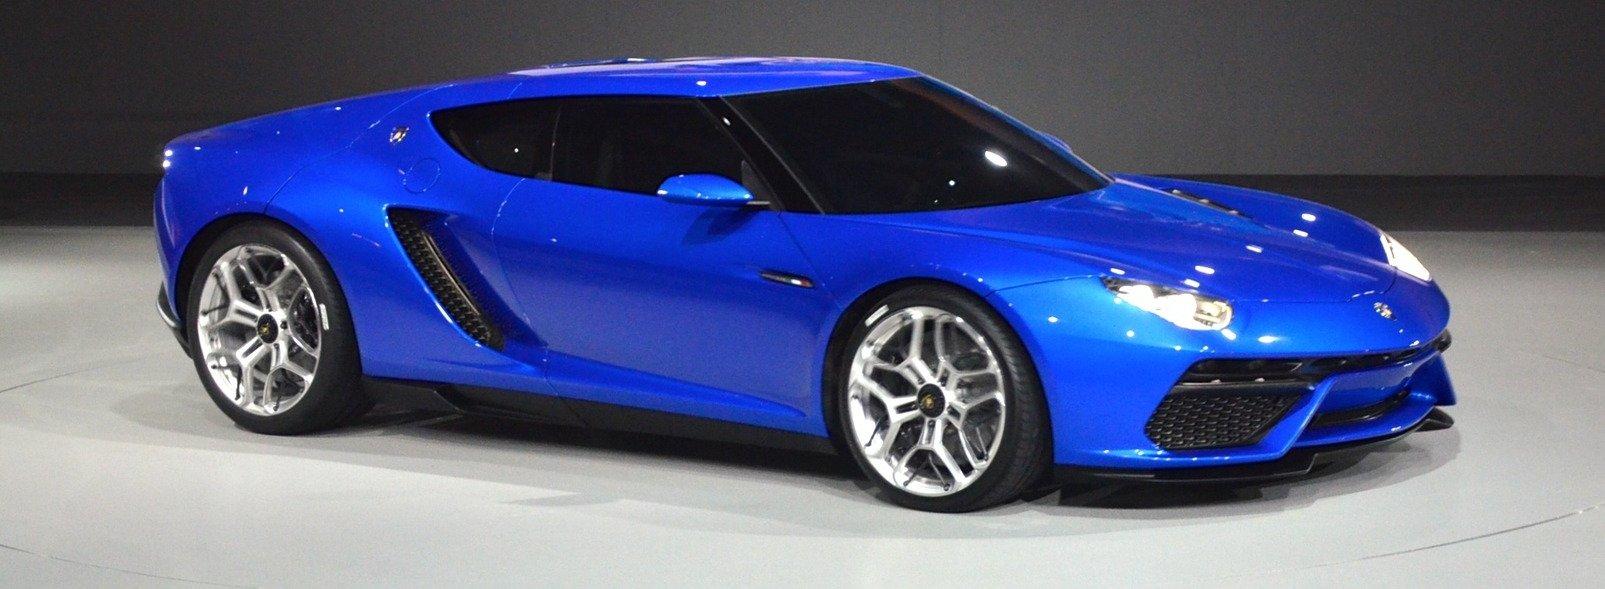 lamborghini-asterion-concept-car